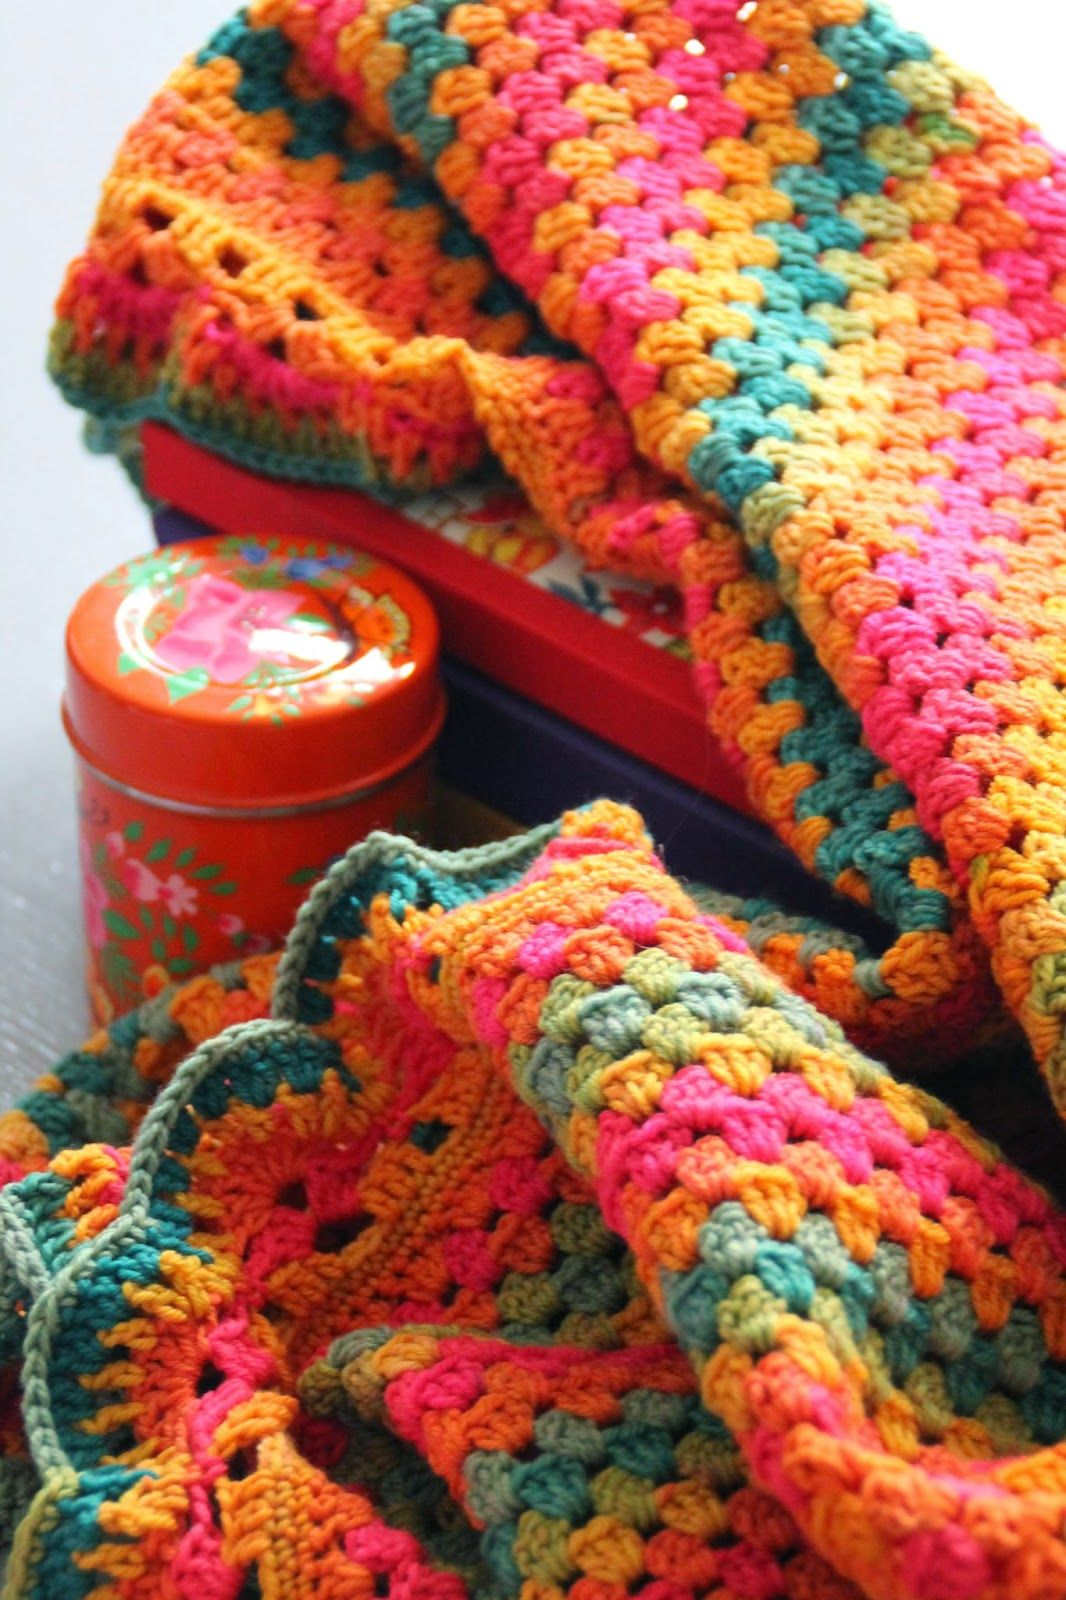 crochet inspiration | ❤ Crochet Patterns and Tutorials ...